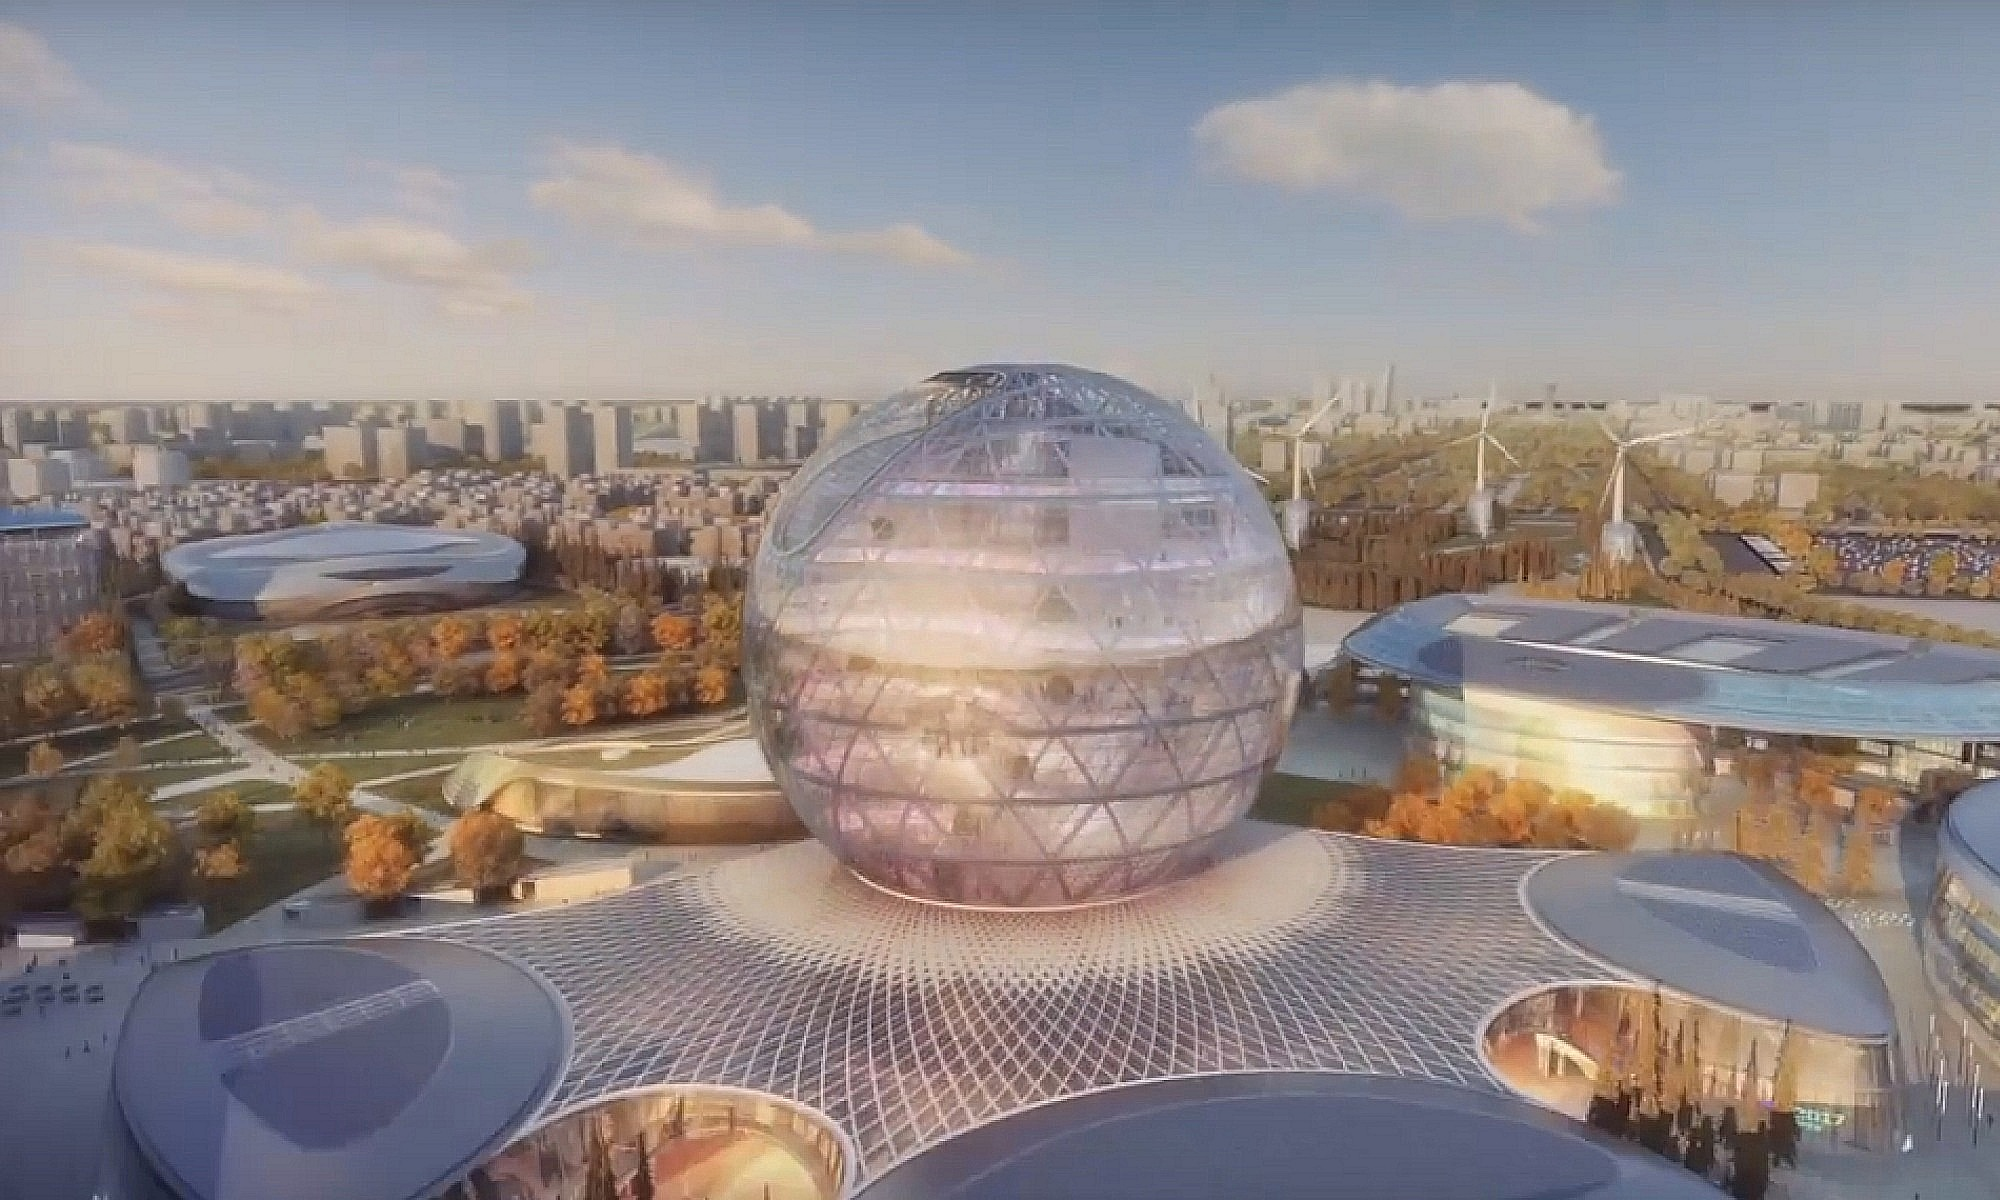 Expo 2017 Astana Kasachstan